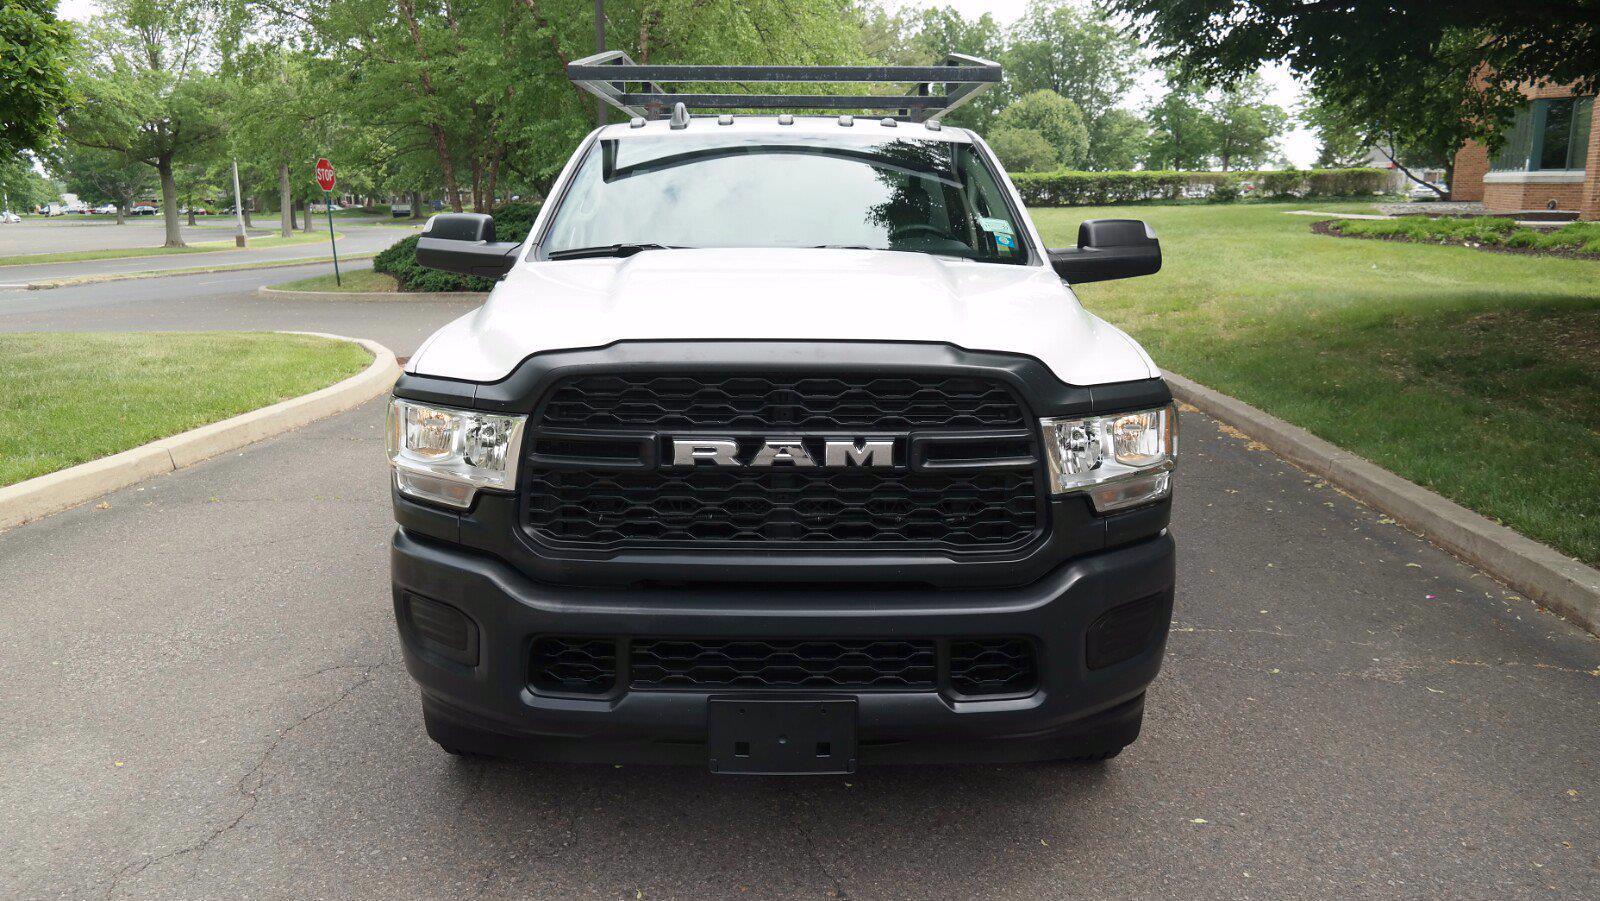 2019 Ram 2500 Regular Cab 4x4, Pickup #FLU009991 - photo 3